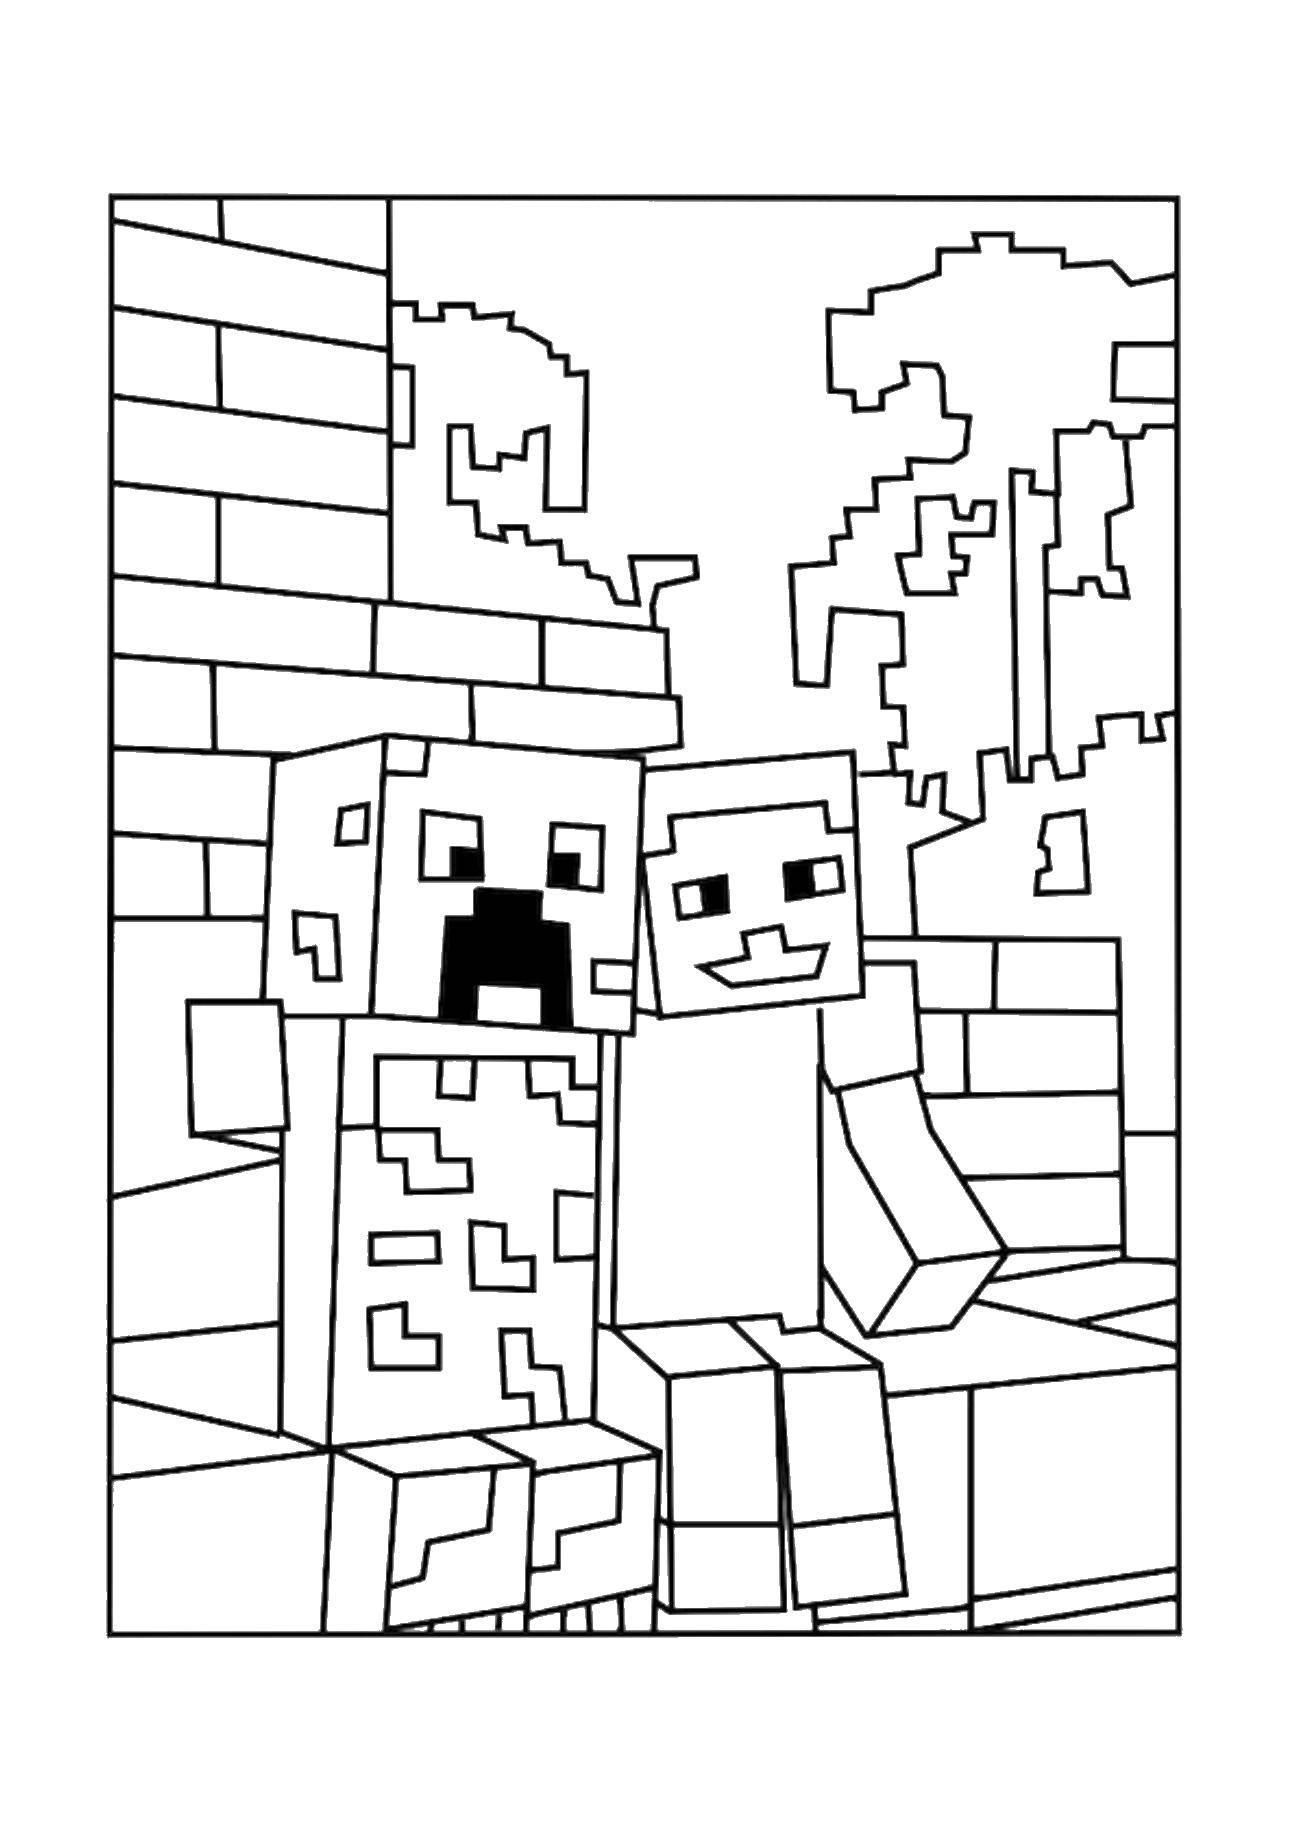 Coloring sheet minecraft Download cum, boy.  Print ,school,